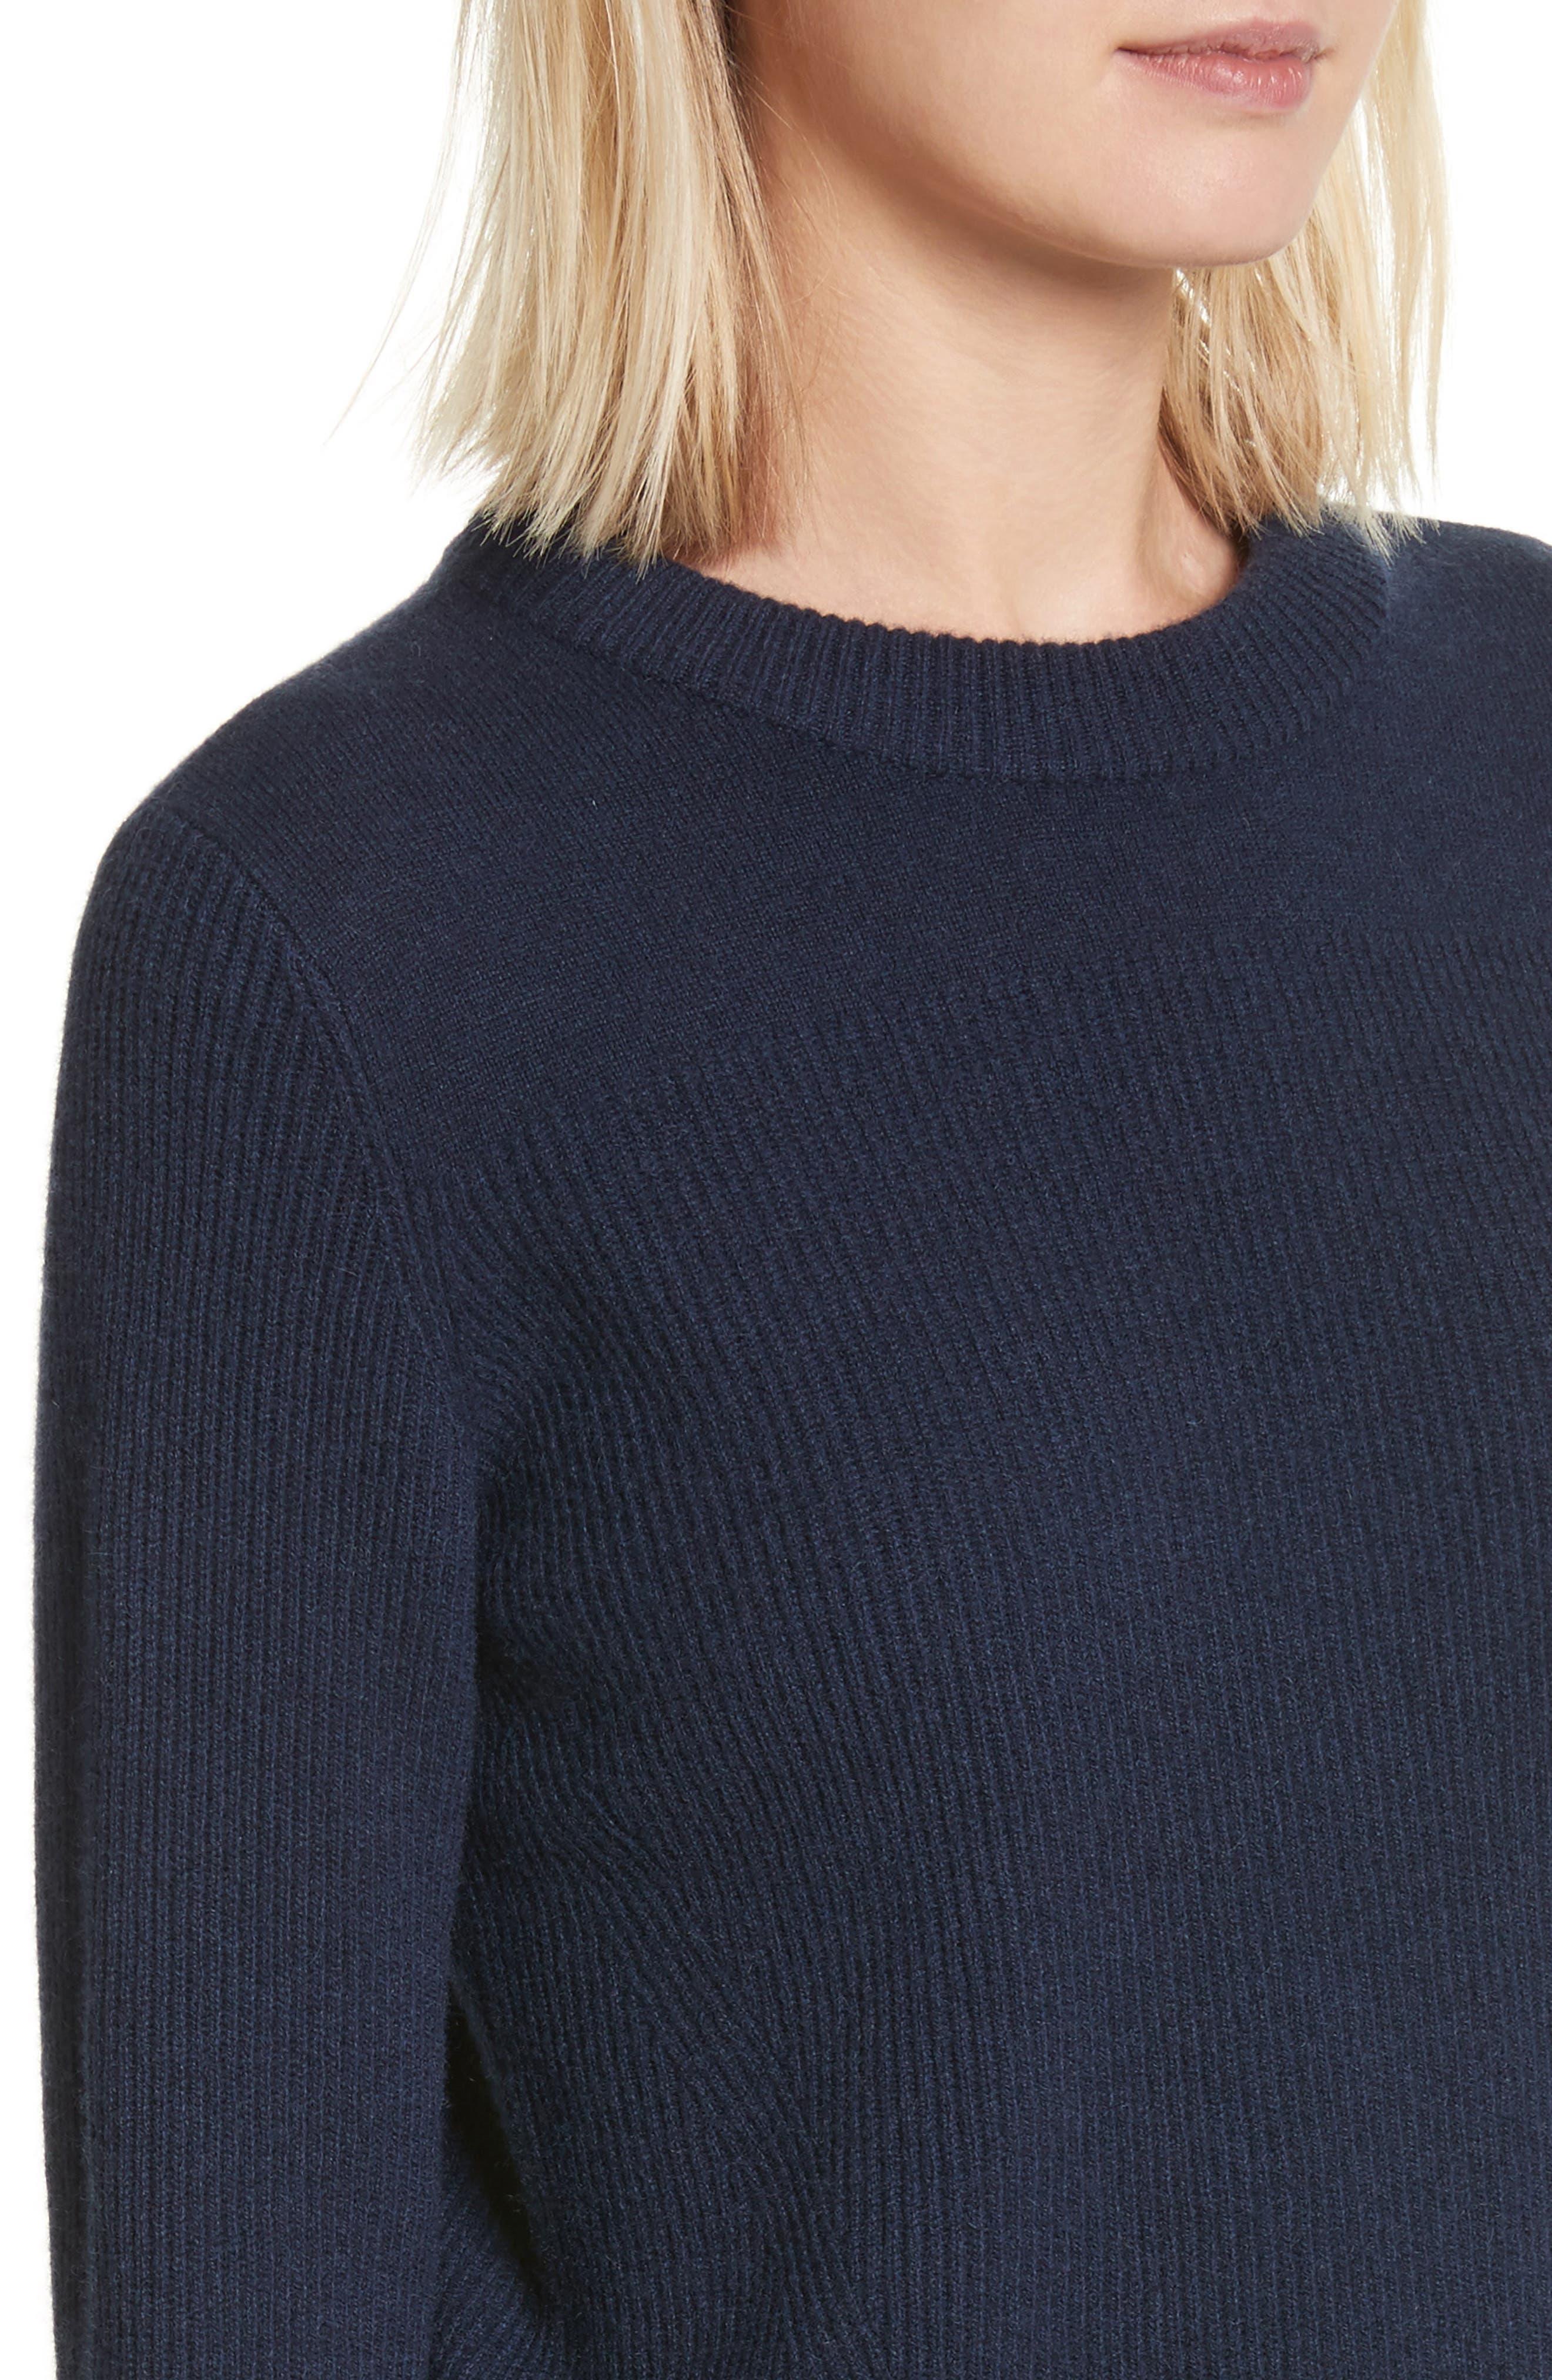 Ace Cashmere Crop Sweater,                             Alternate thumbnail 4, color,                             410